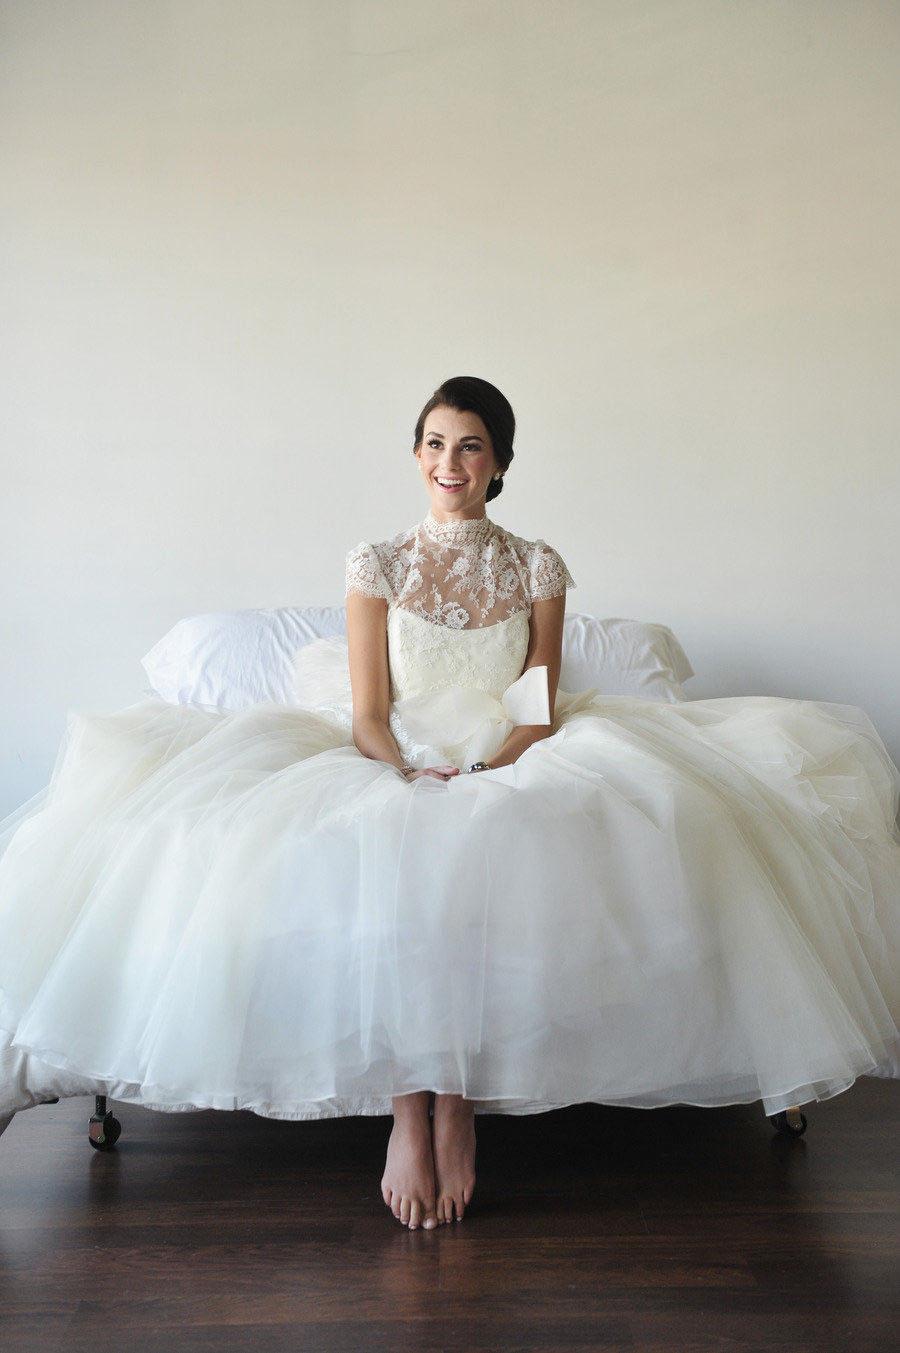 Ballet style dresses